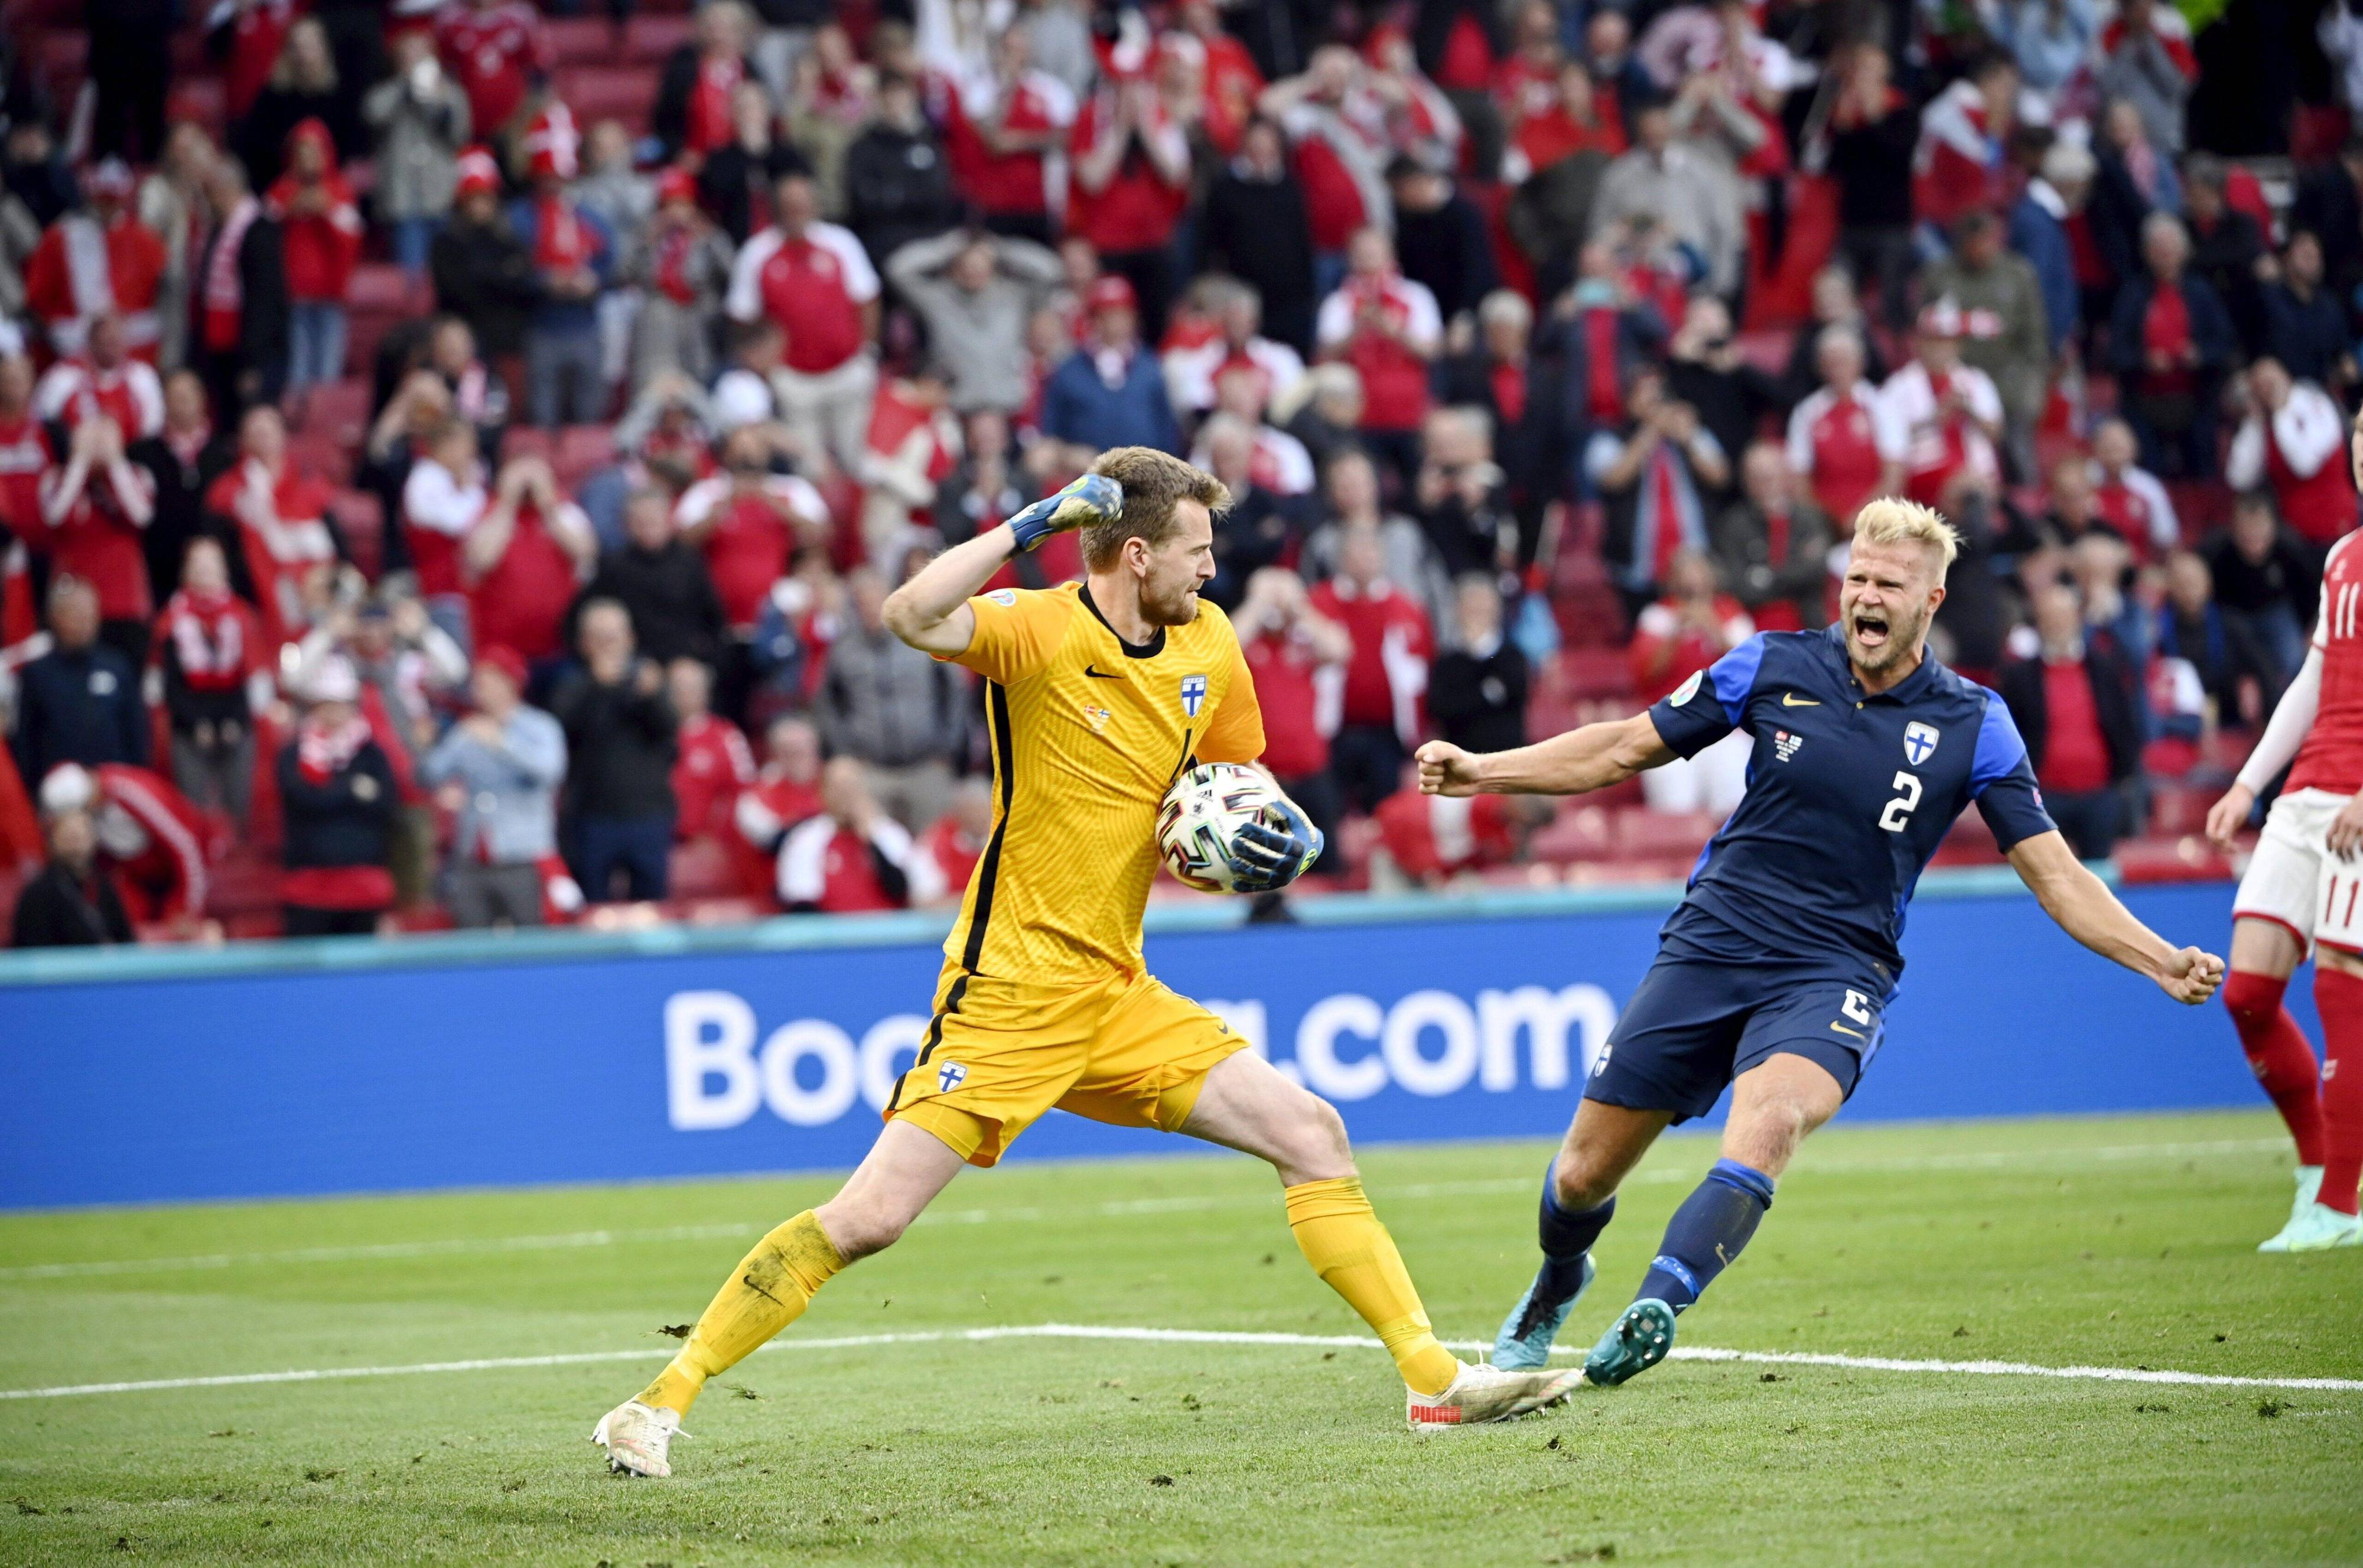 Jubeln nach dem Schock: Finnland gewinnt bei der EM 2021 gegen Dänemark.